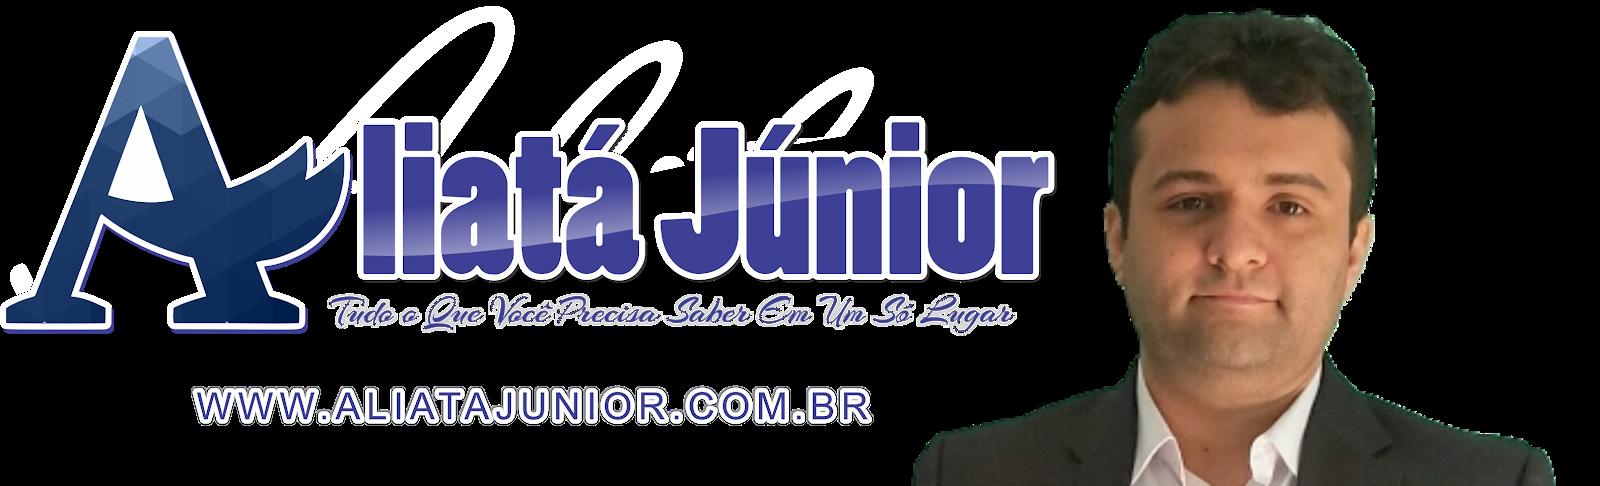 Aliatá Júnior